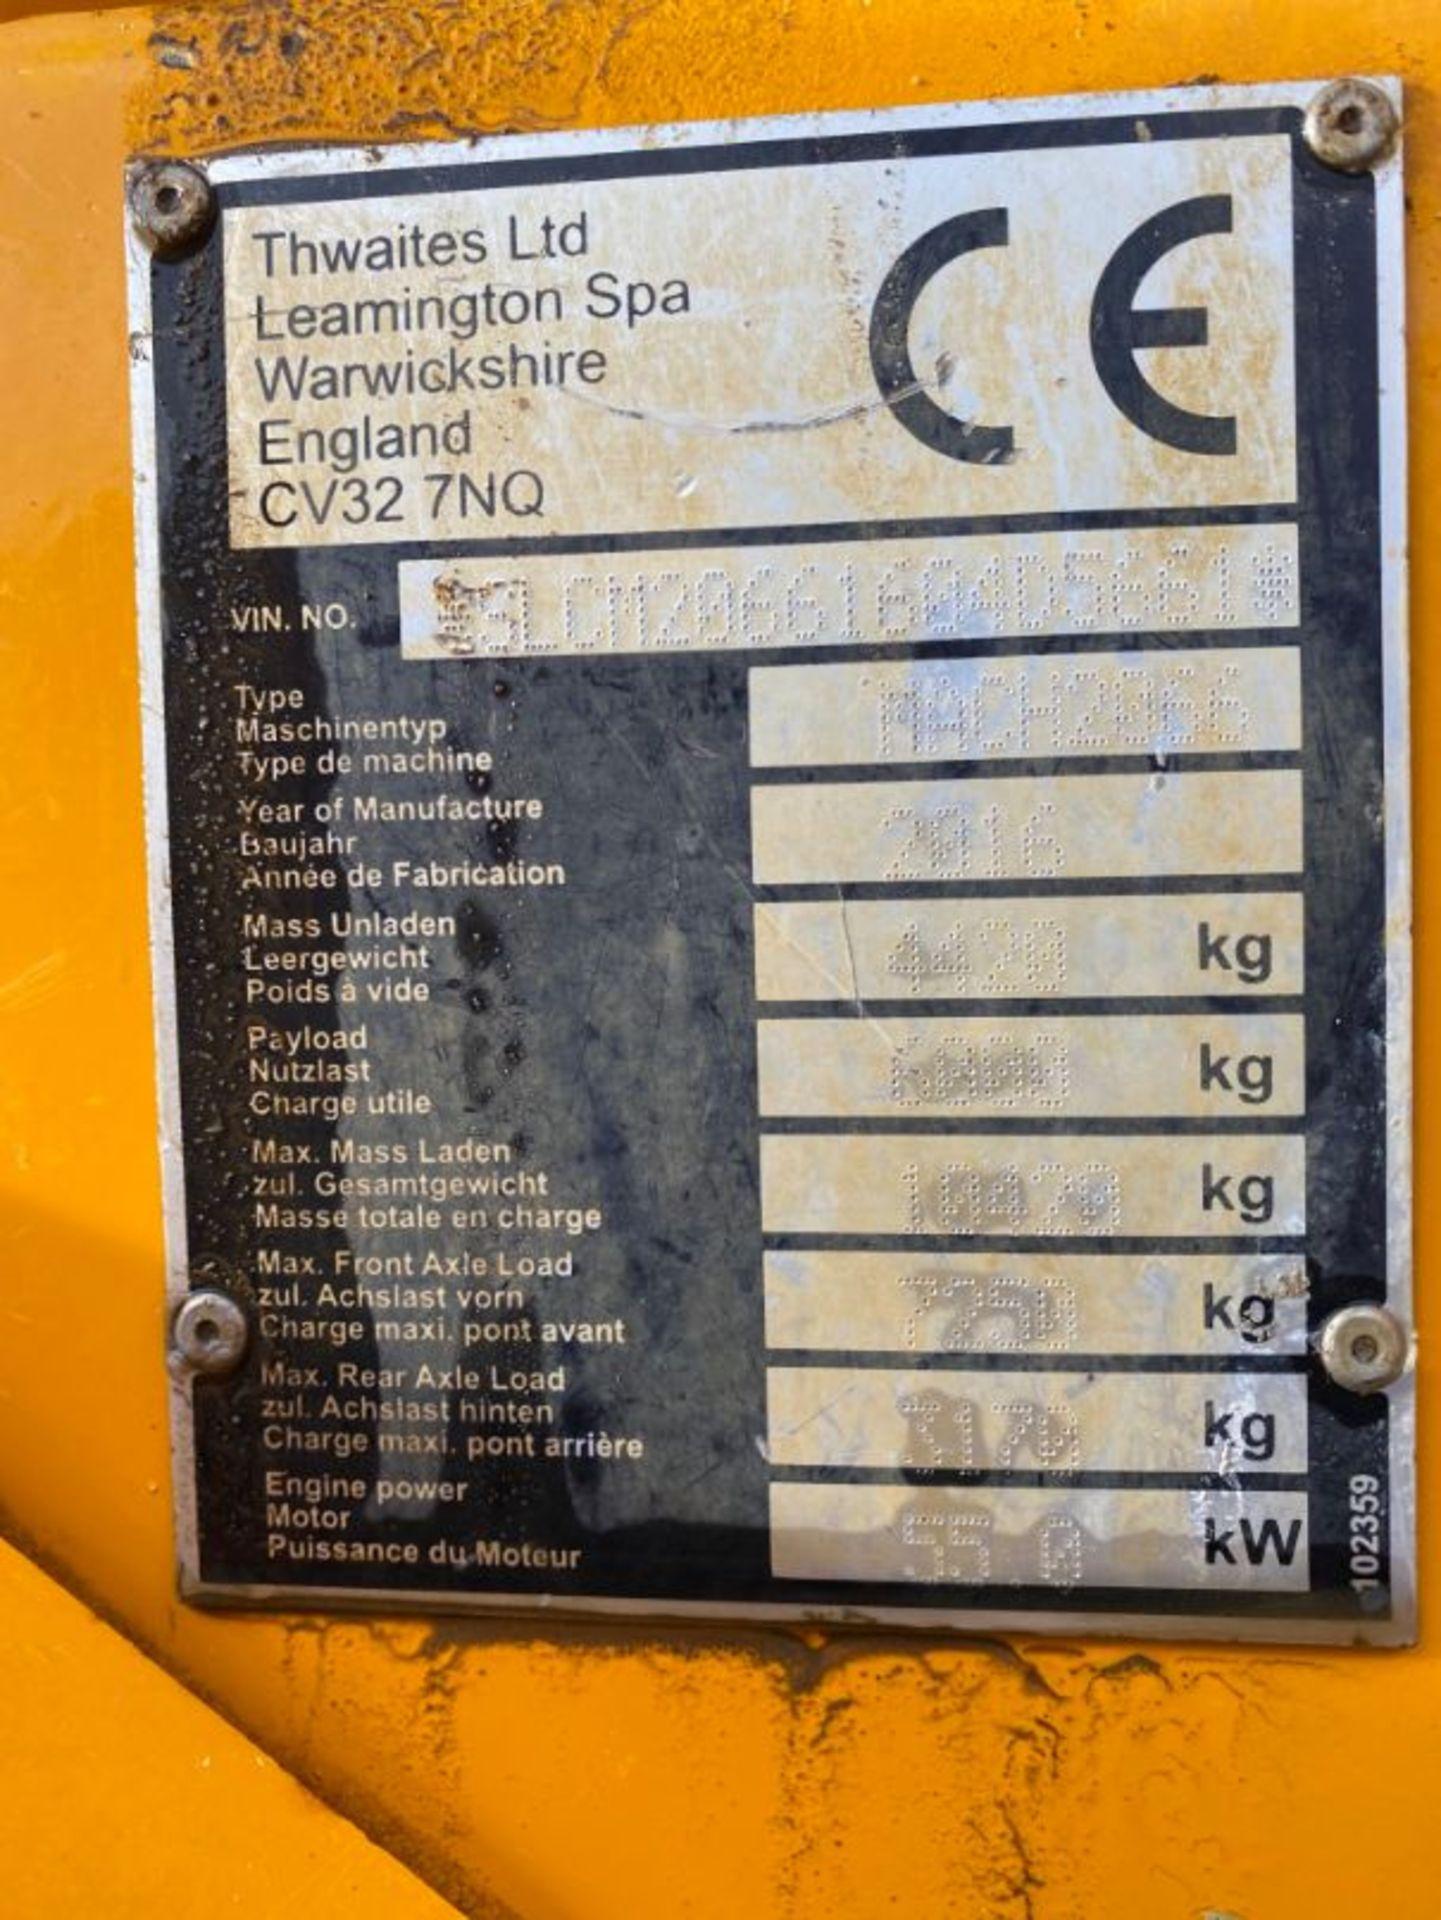 Lot 7 - Thwaites Mach 2066 6-tonne swivel tip dumper truck, reg no RV16 OZN: date of registration: 1.5.2016